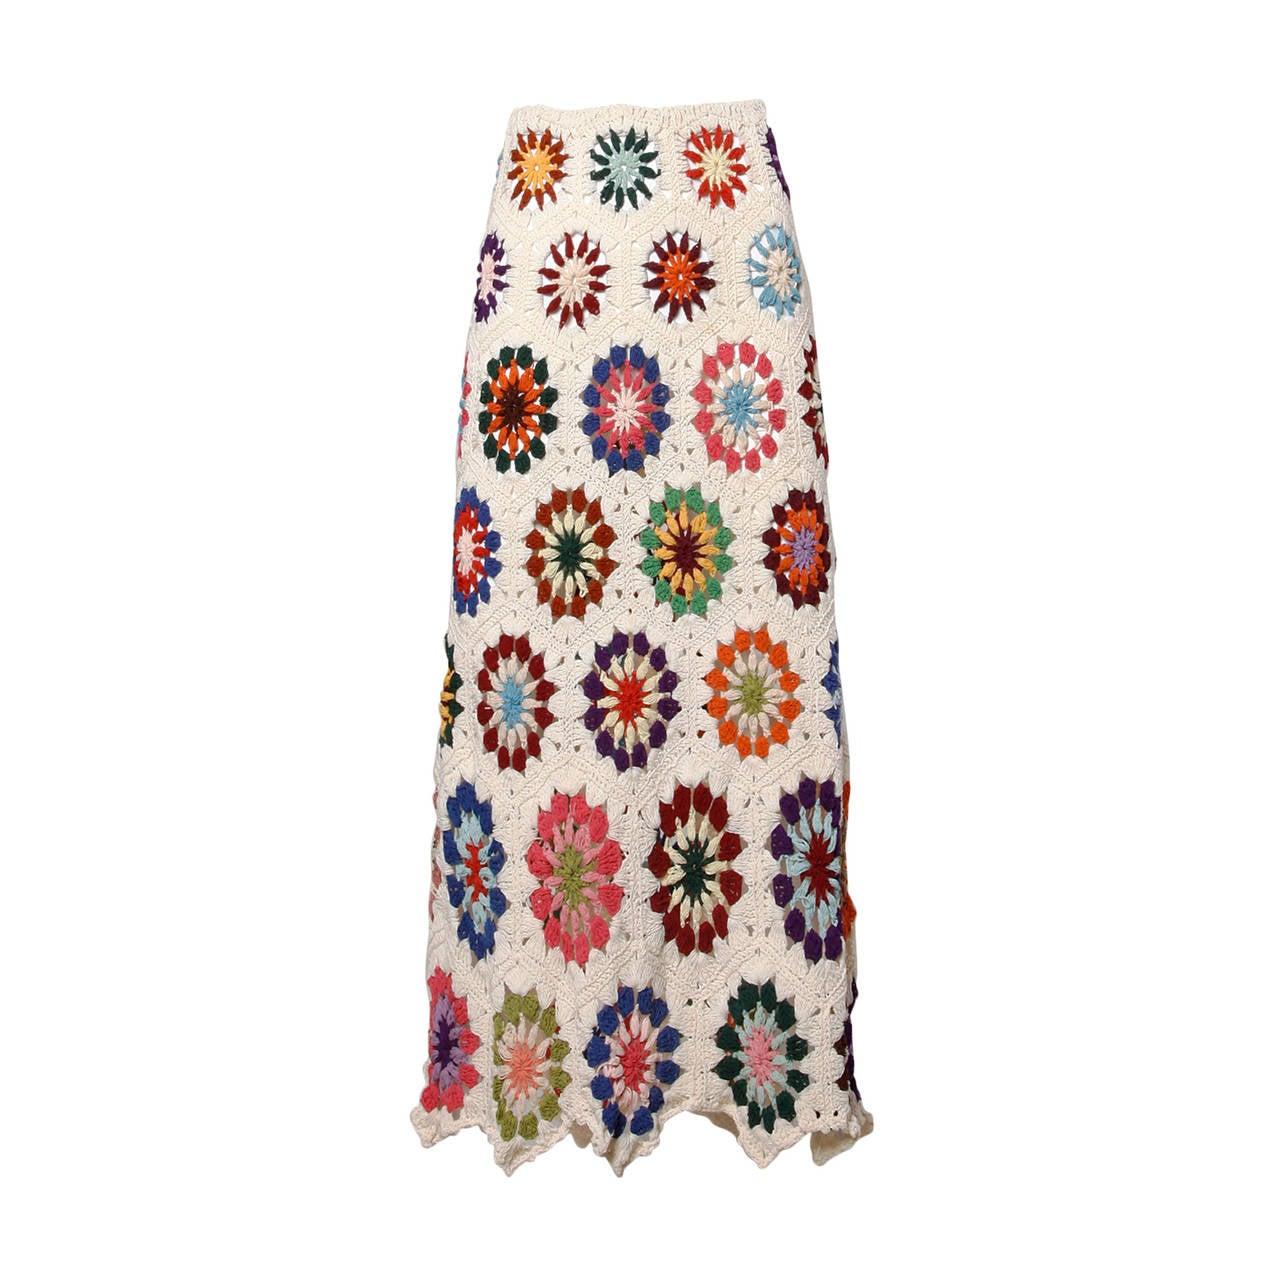 1970s Vintage Colorful Hand-Crochet Boho Maxi Skirt 1